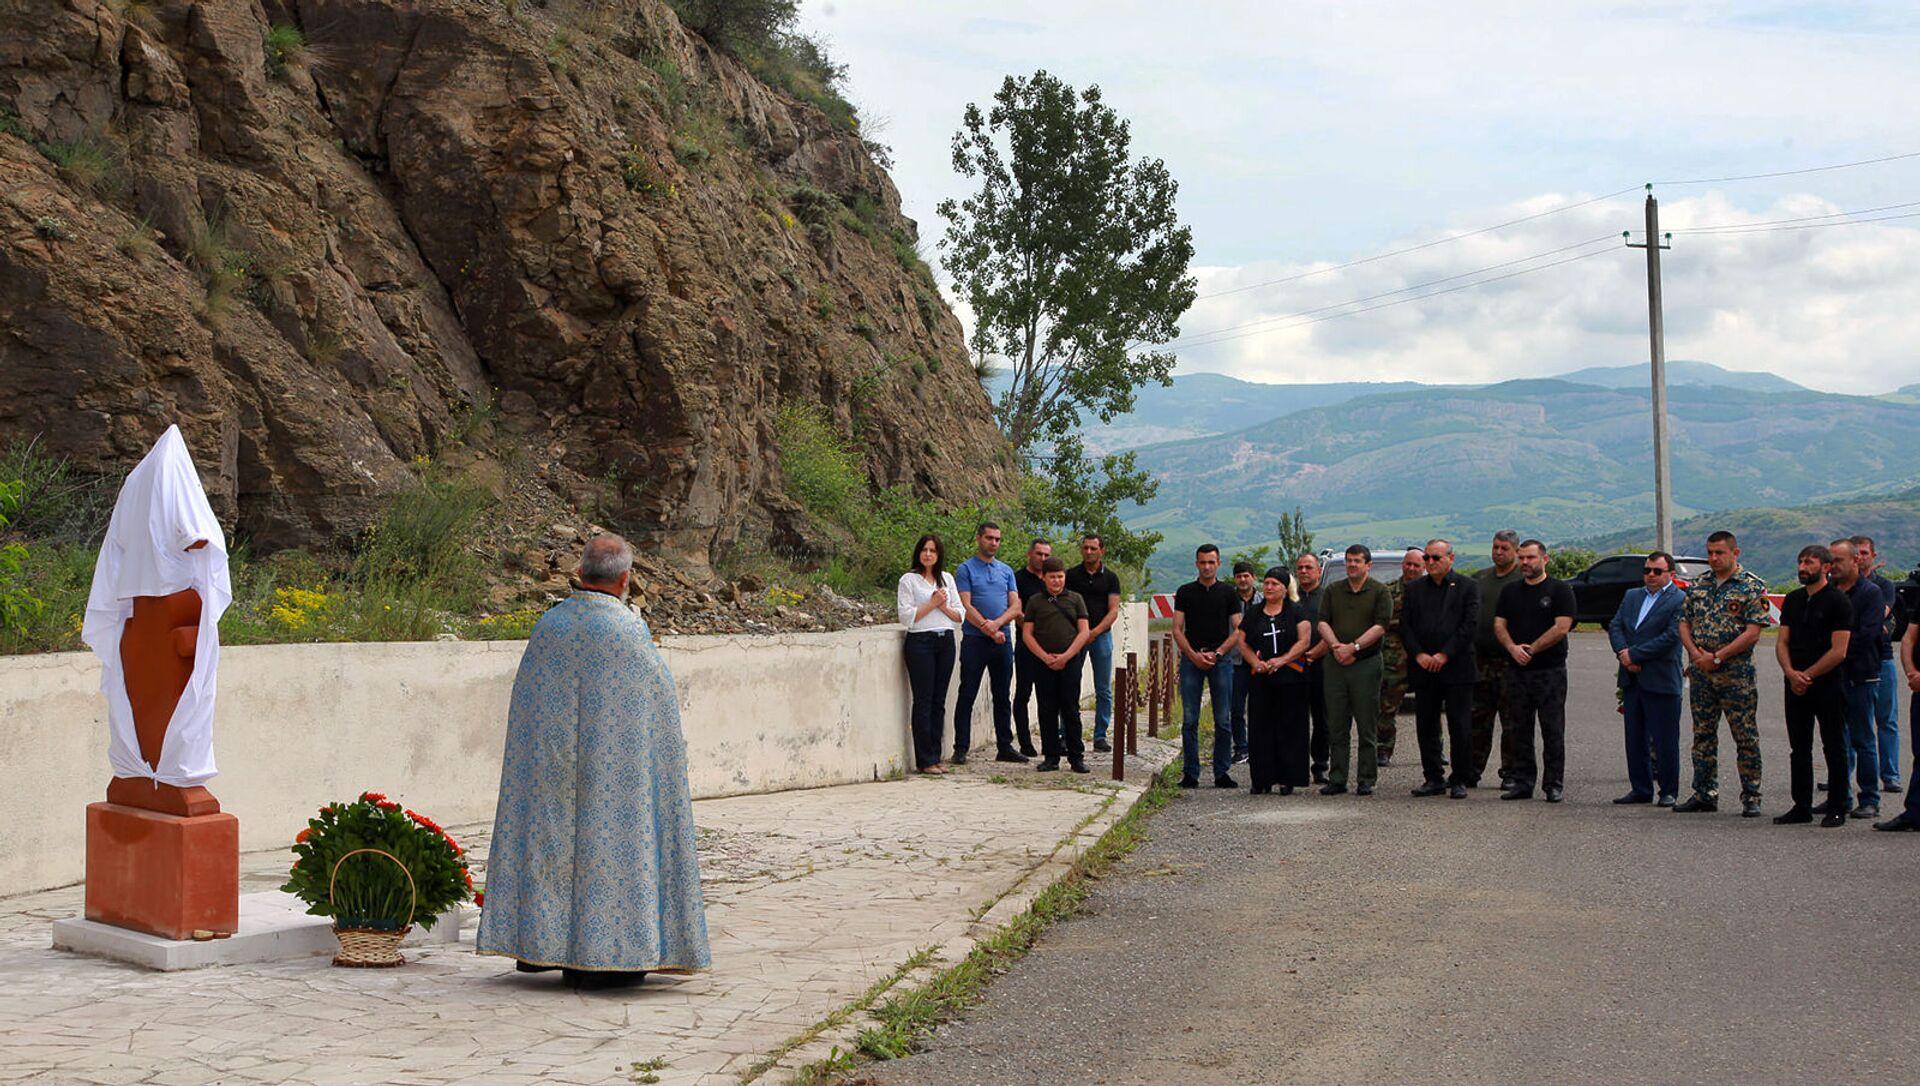 У памятника Танк в Шуши открылся хачкар, увековечивающий память Героя Арцаха Акопа Арутюняна (28 мая 2021). Карабах - Sputnik Արմենիա, 1920, 28.05.2021